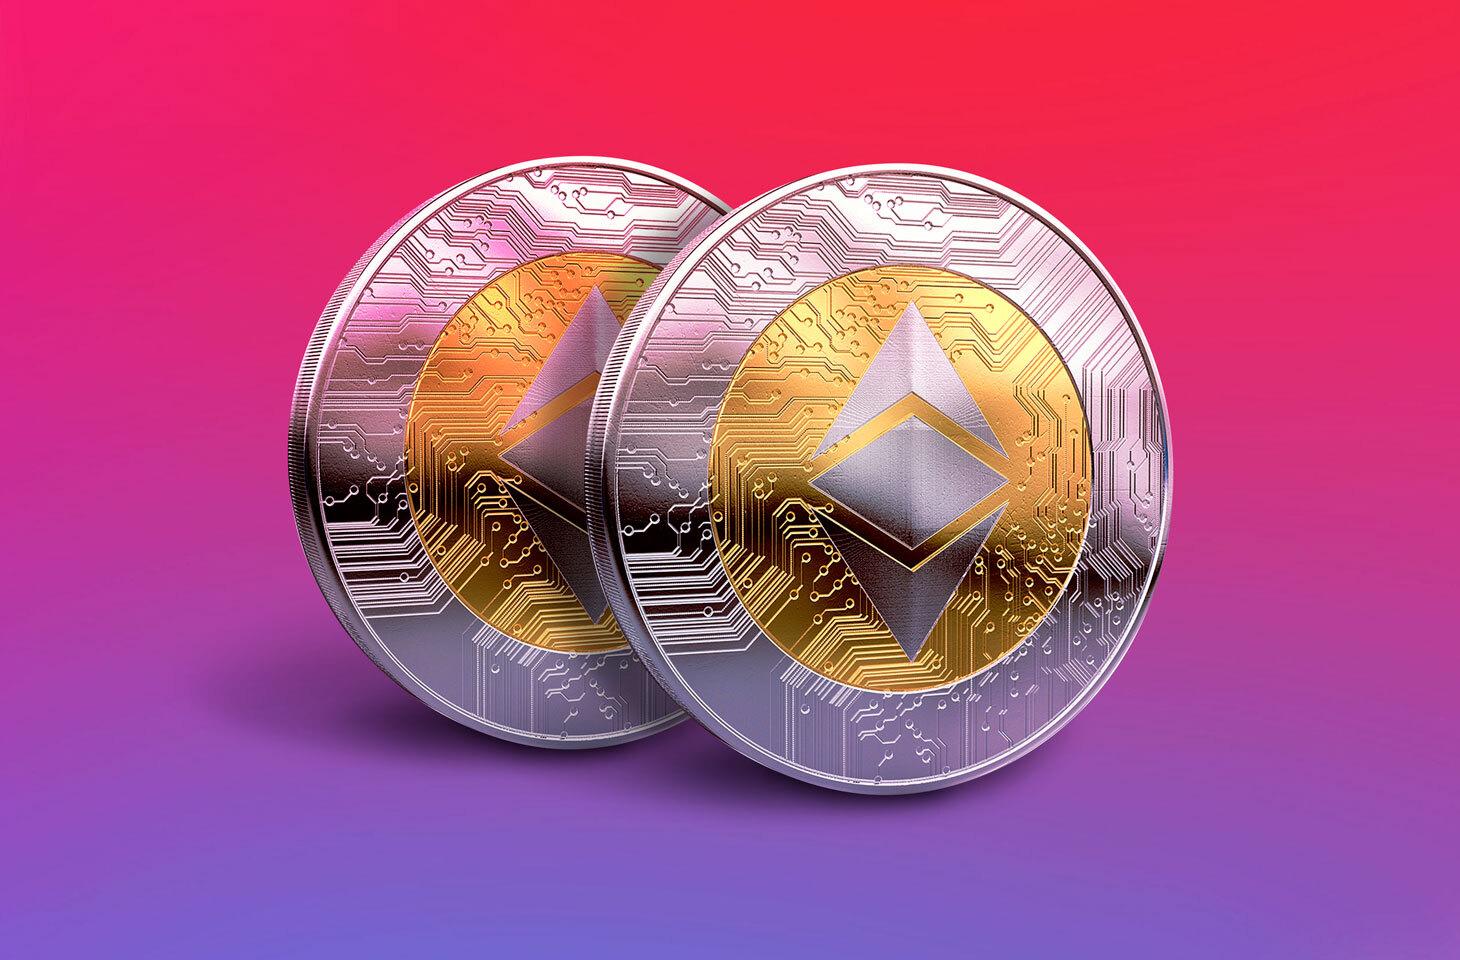 Crypto-arnaque sur Discord : faux sites d'informations | Blog officiel de Kaspersky